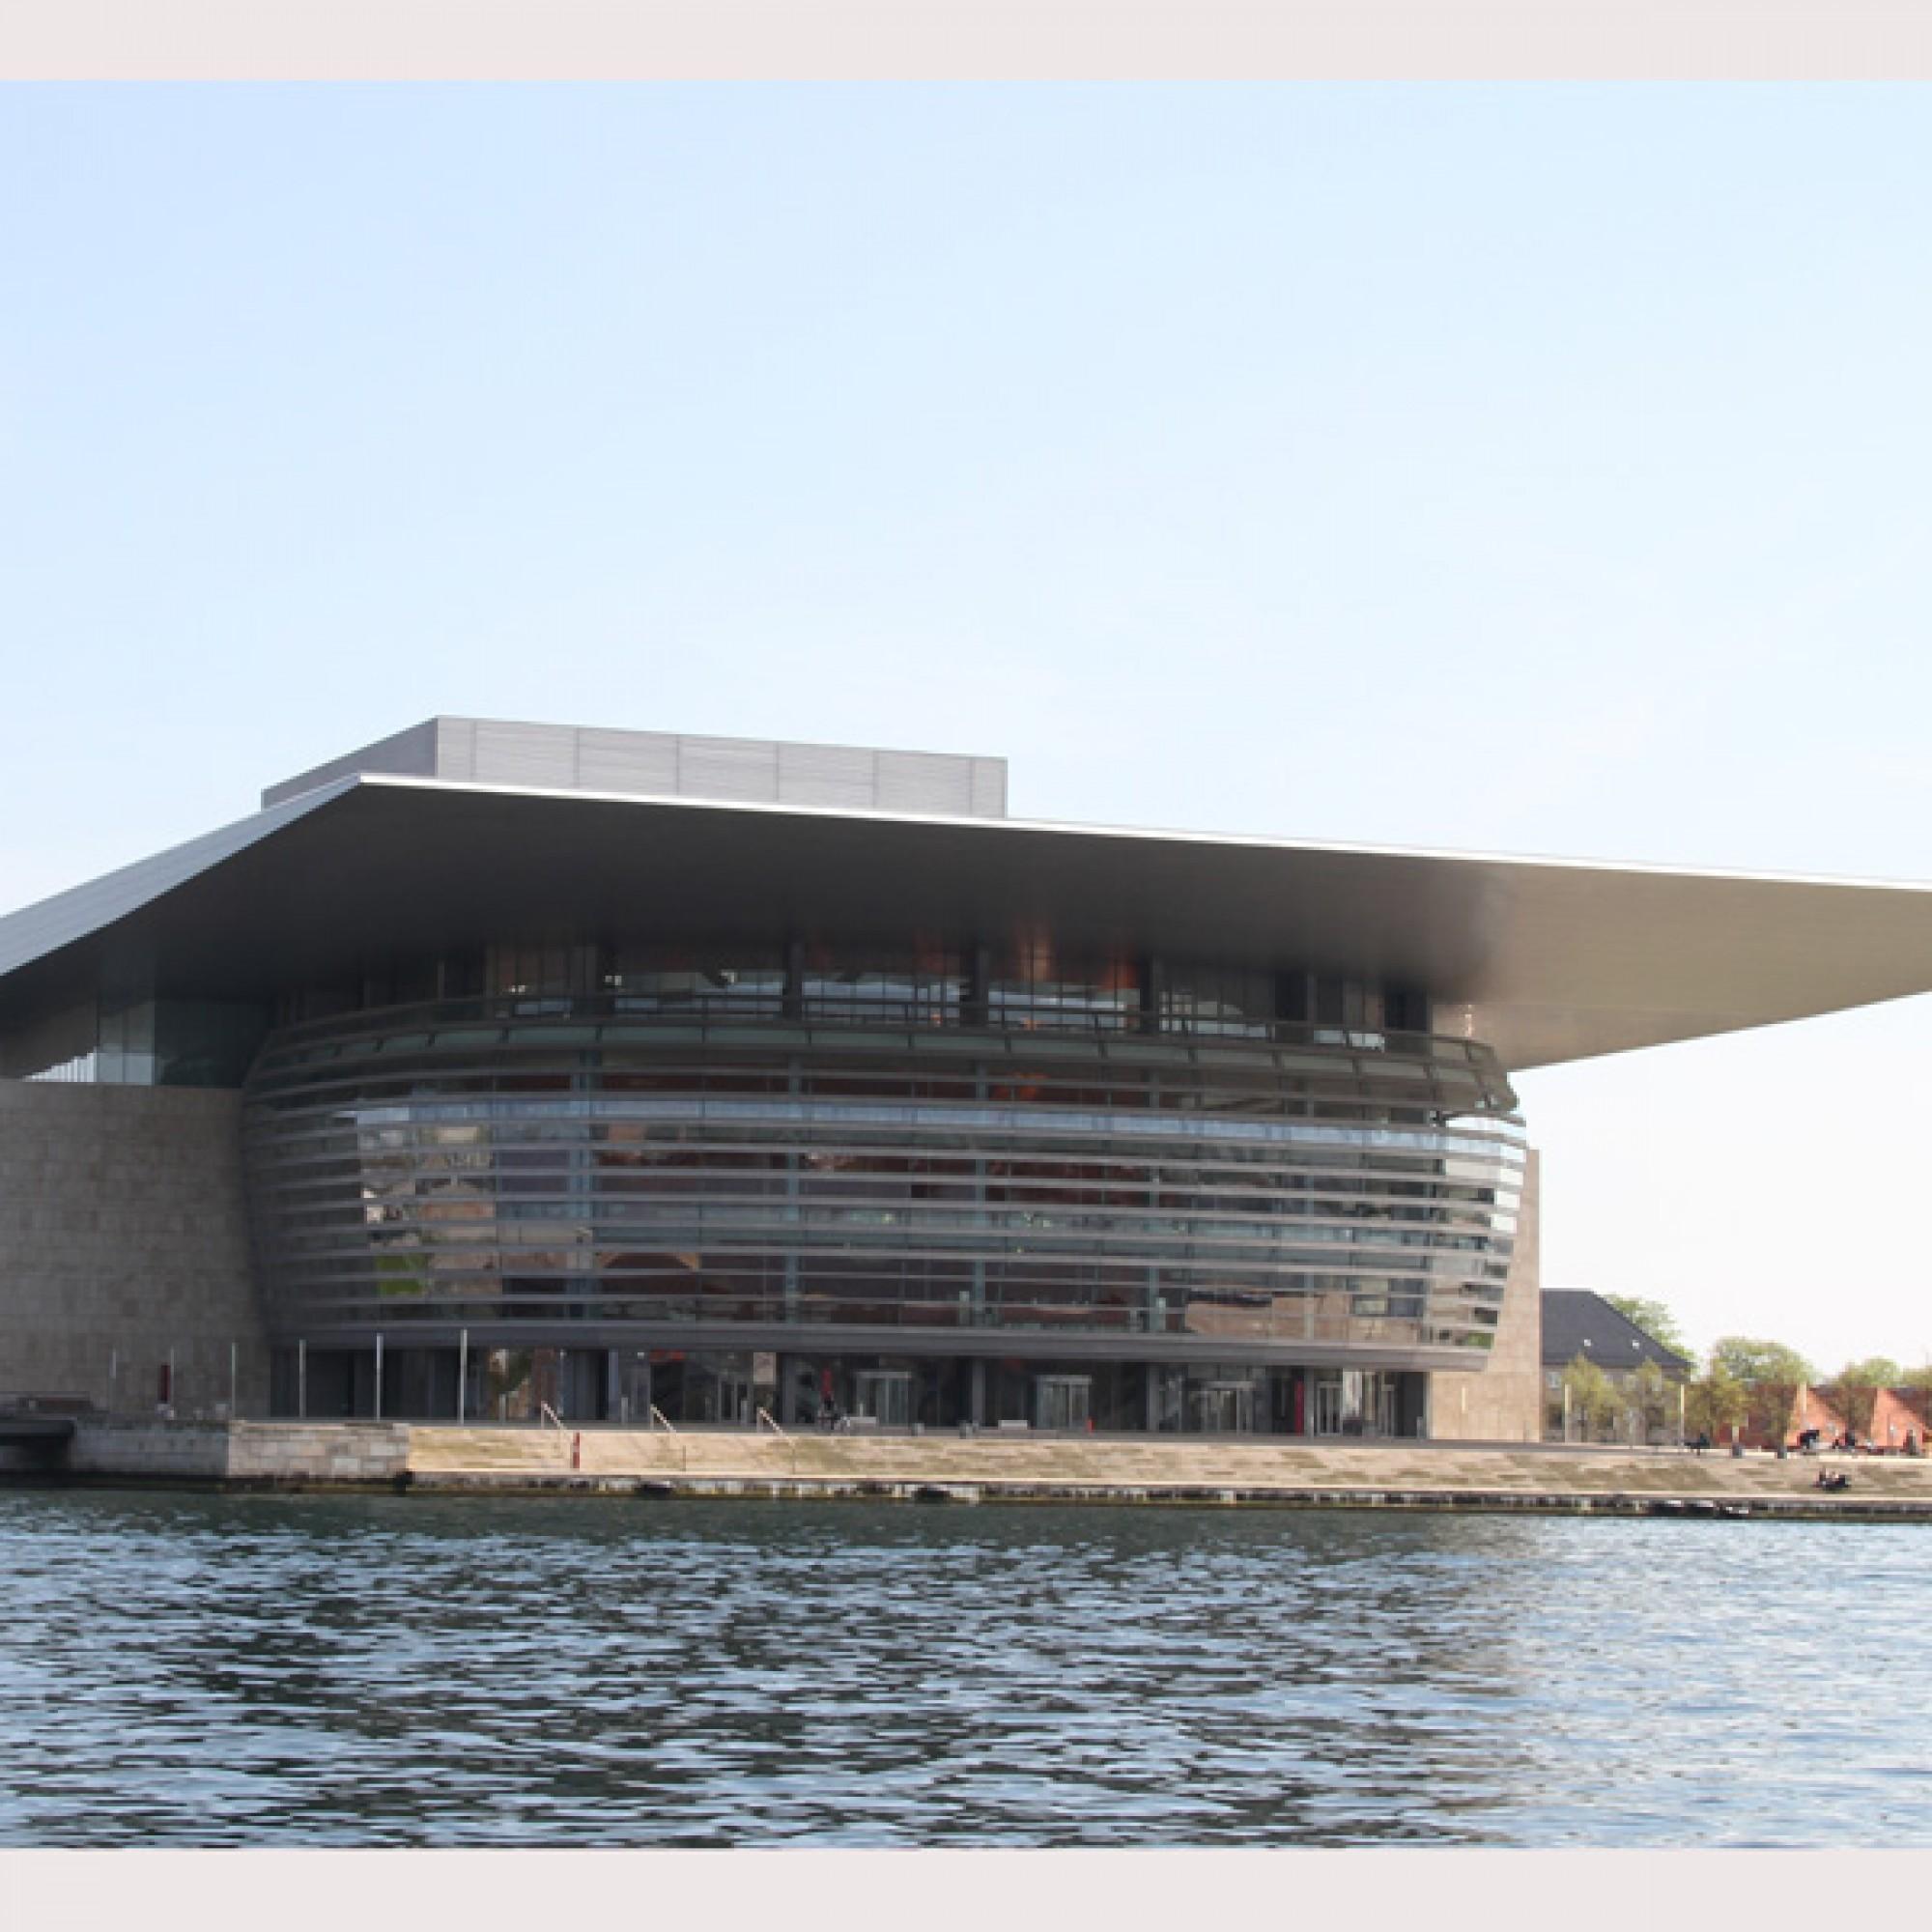 Königliche Oper Kopenhagen 2012 (wikimedia.org, Bjoertvedt, CC)